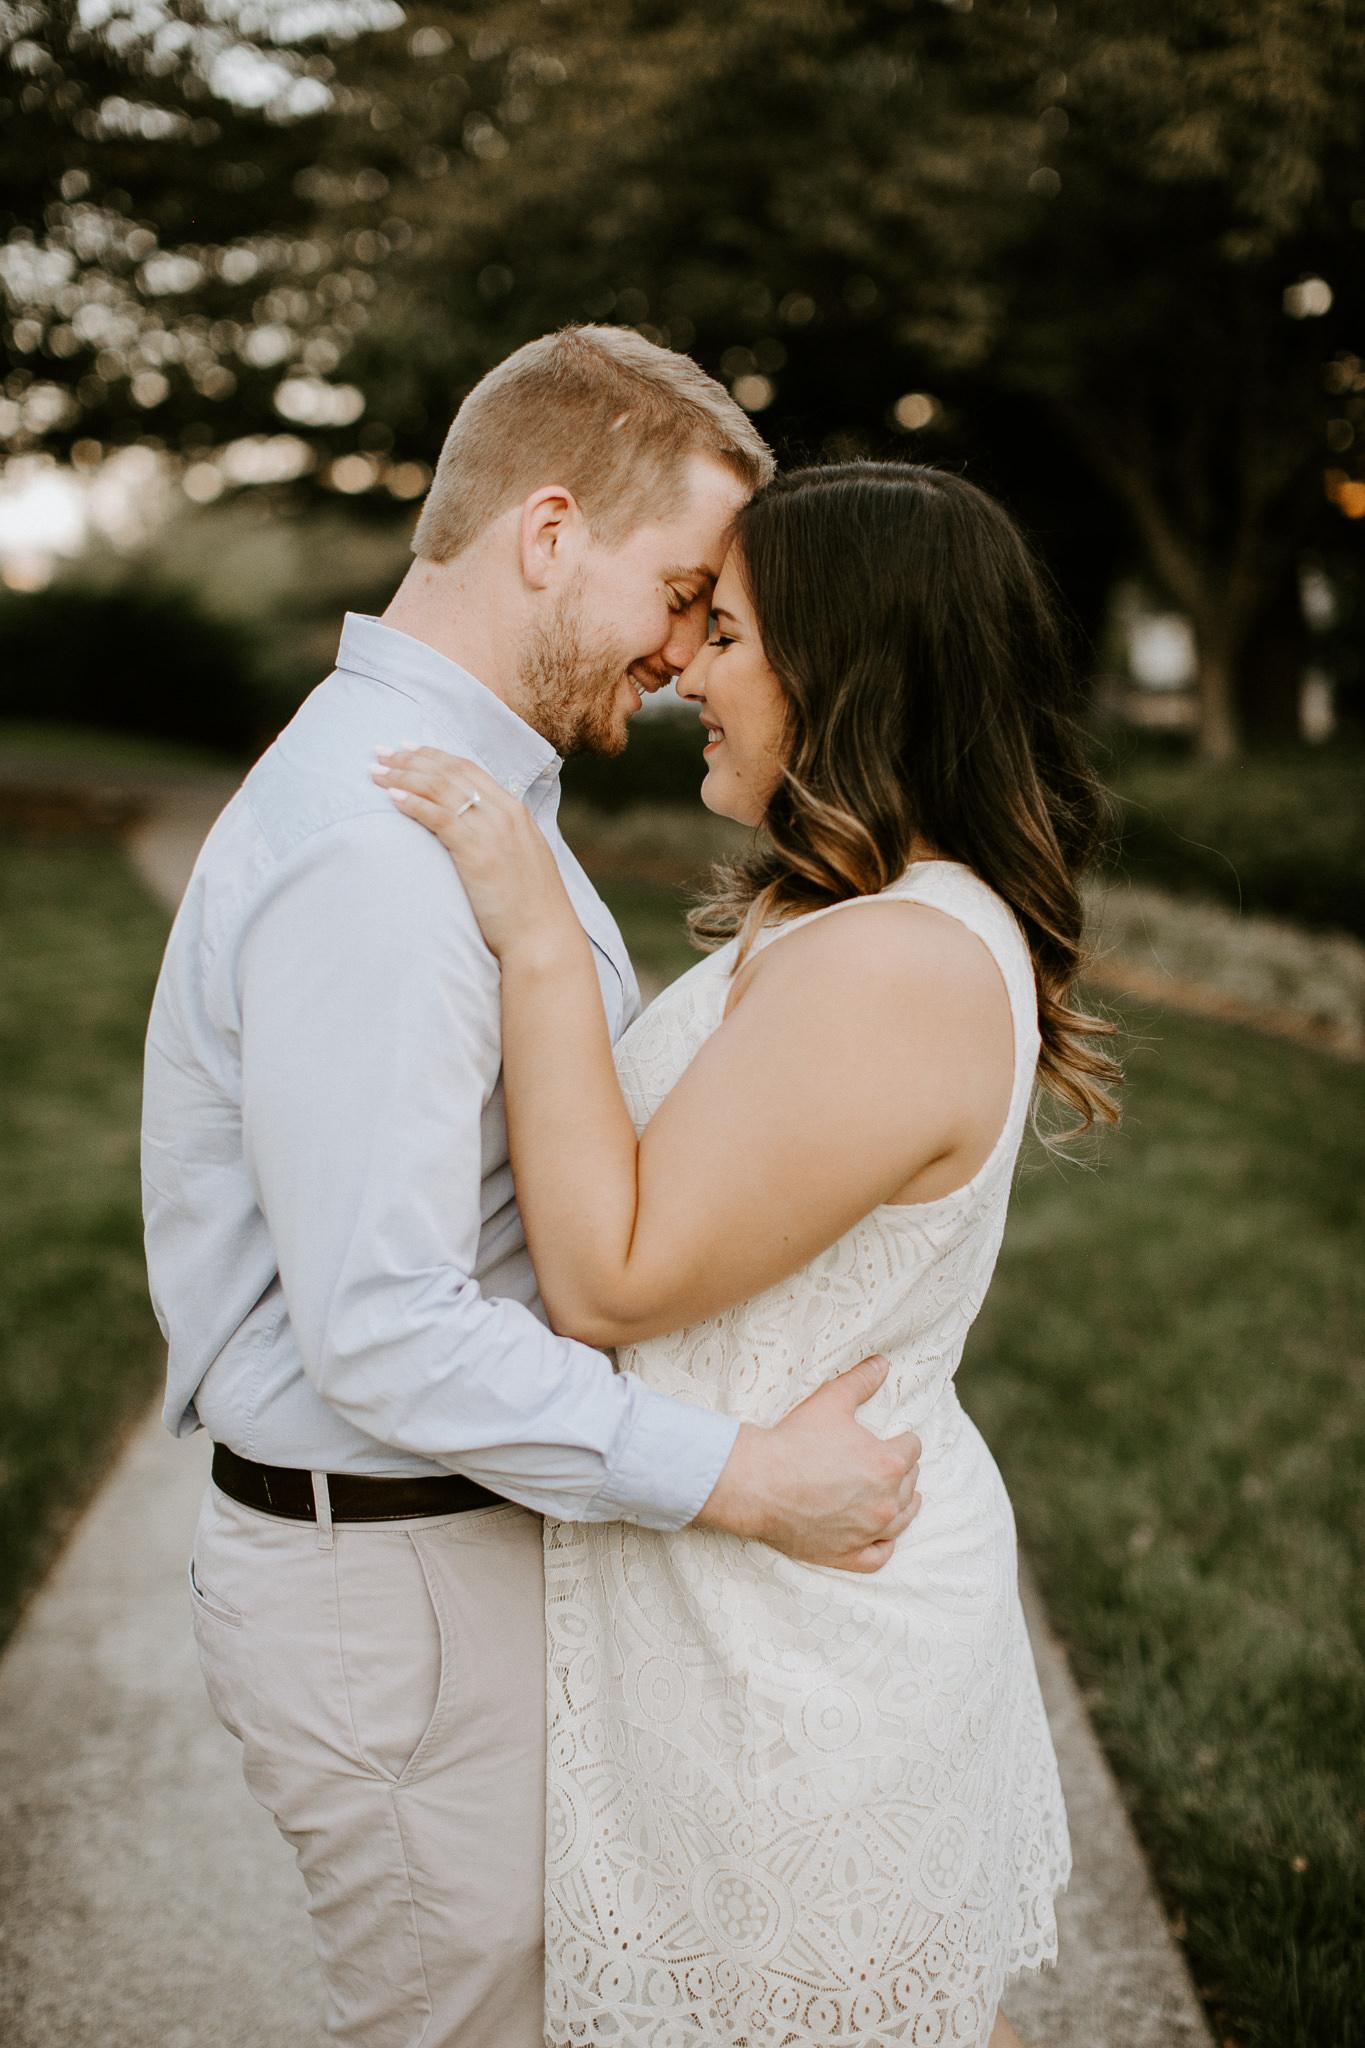 Engagement - Downtown Roanoke -  Wedding Photographer - Virginia - Best - Pat Cori Photography-27.jpg